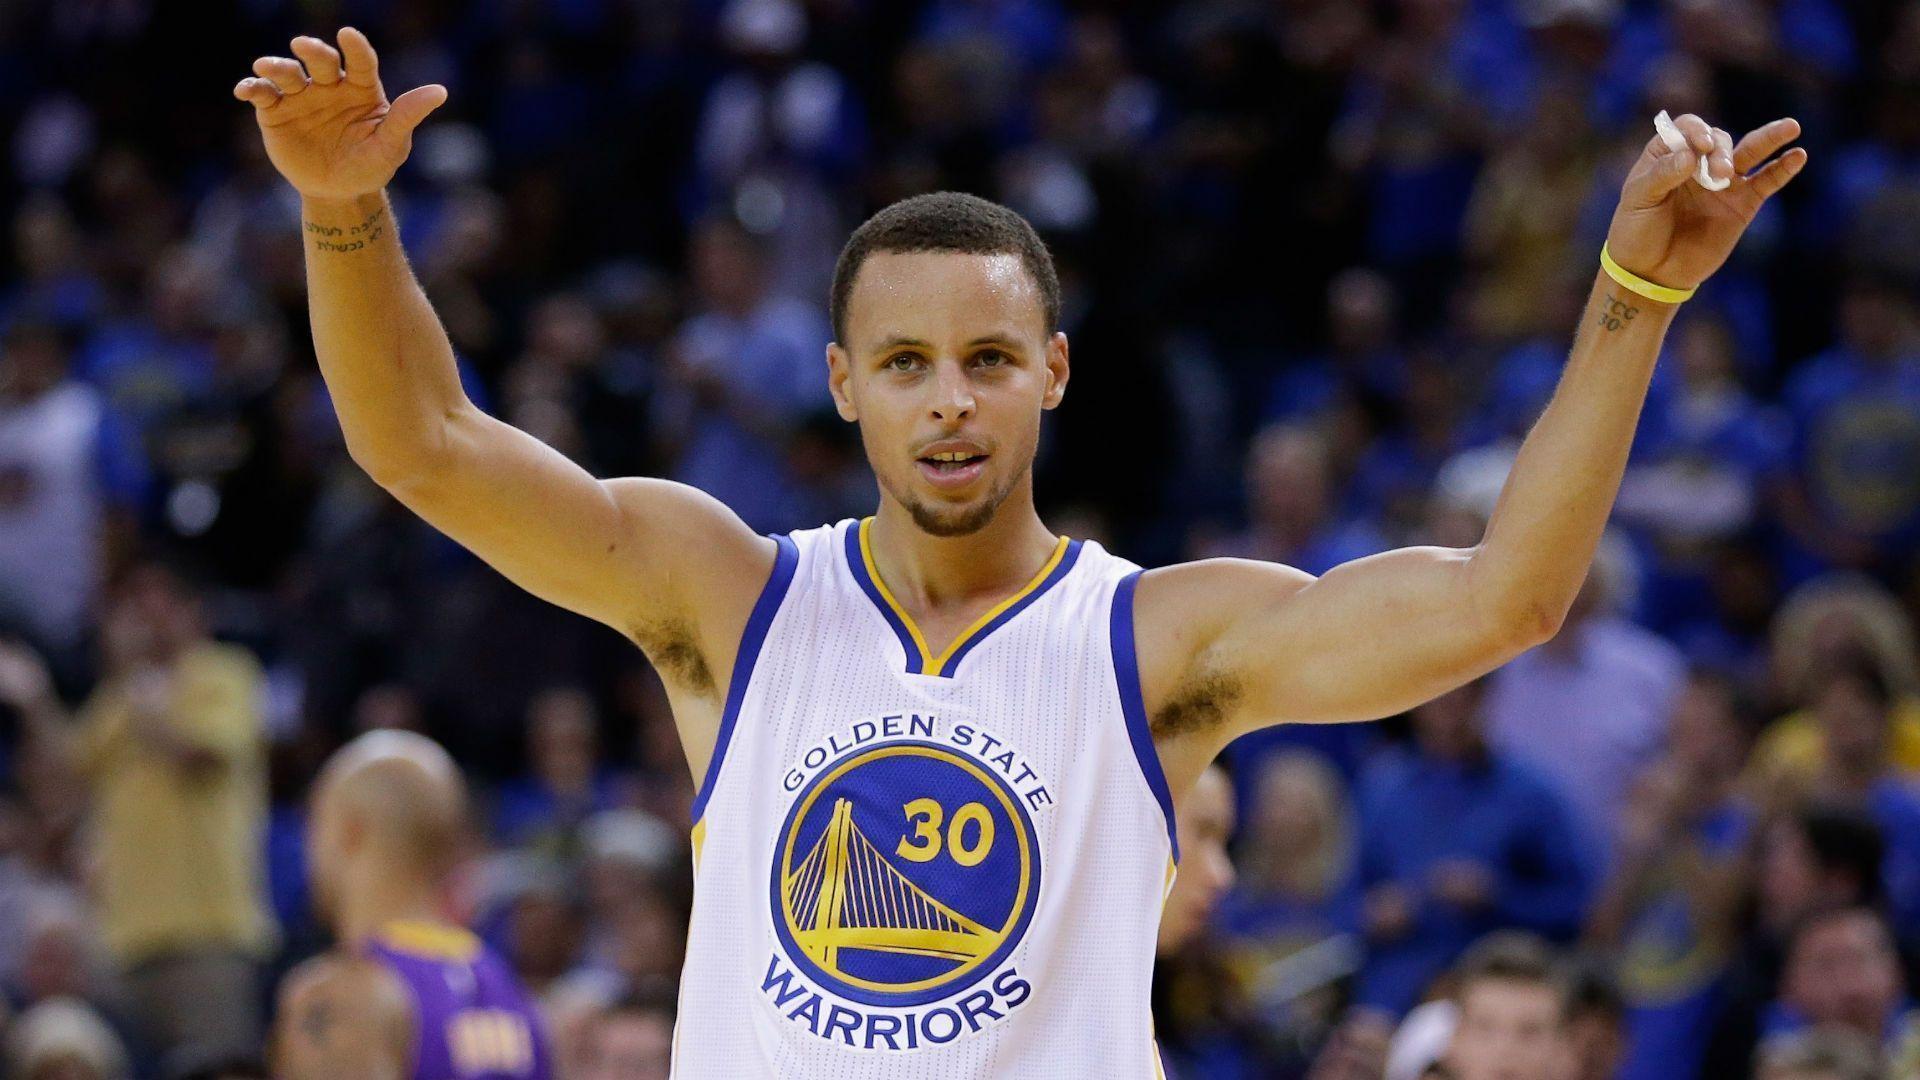 Nba Wallpaper Stephen Curry: NBA Wallpapers 2016